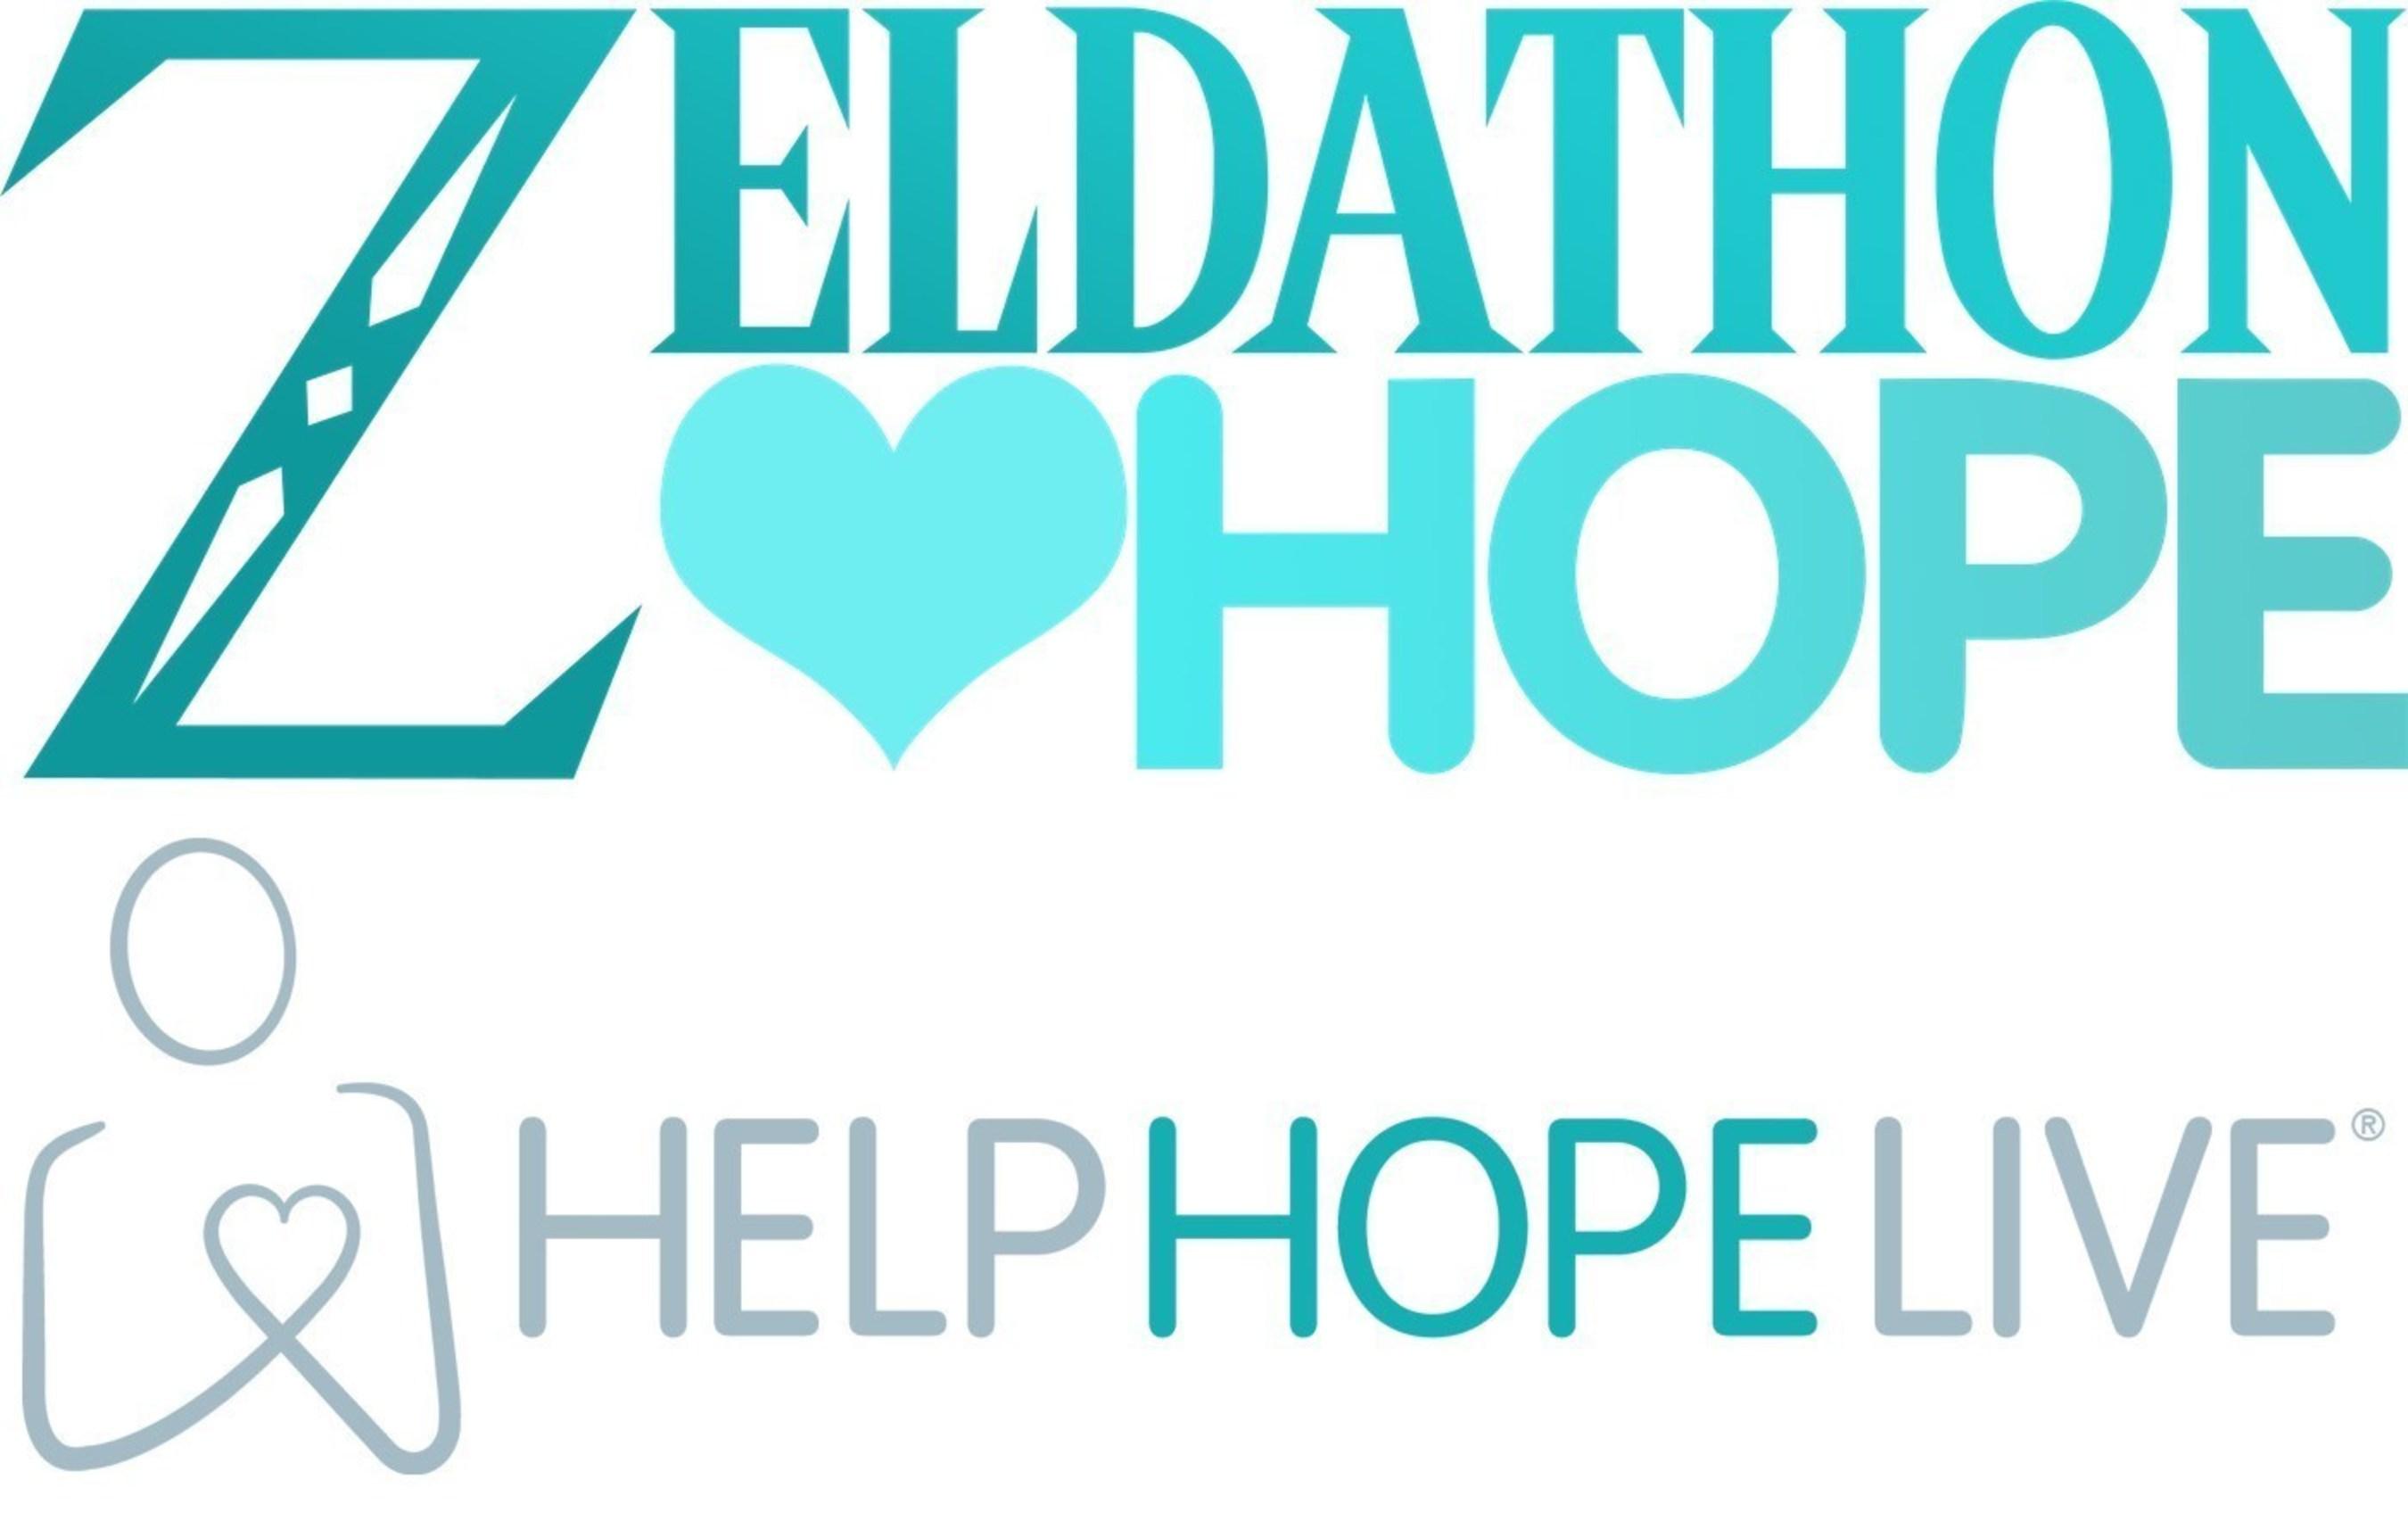 Zeldathon Hope (zeldathon.net) is a 150-hour gaming marathon to raise money for top-ranked charity HelpHOPELive (helphopelive.org).